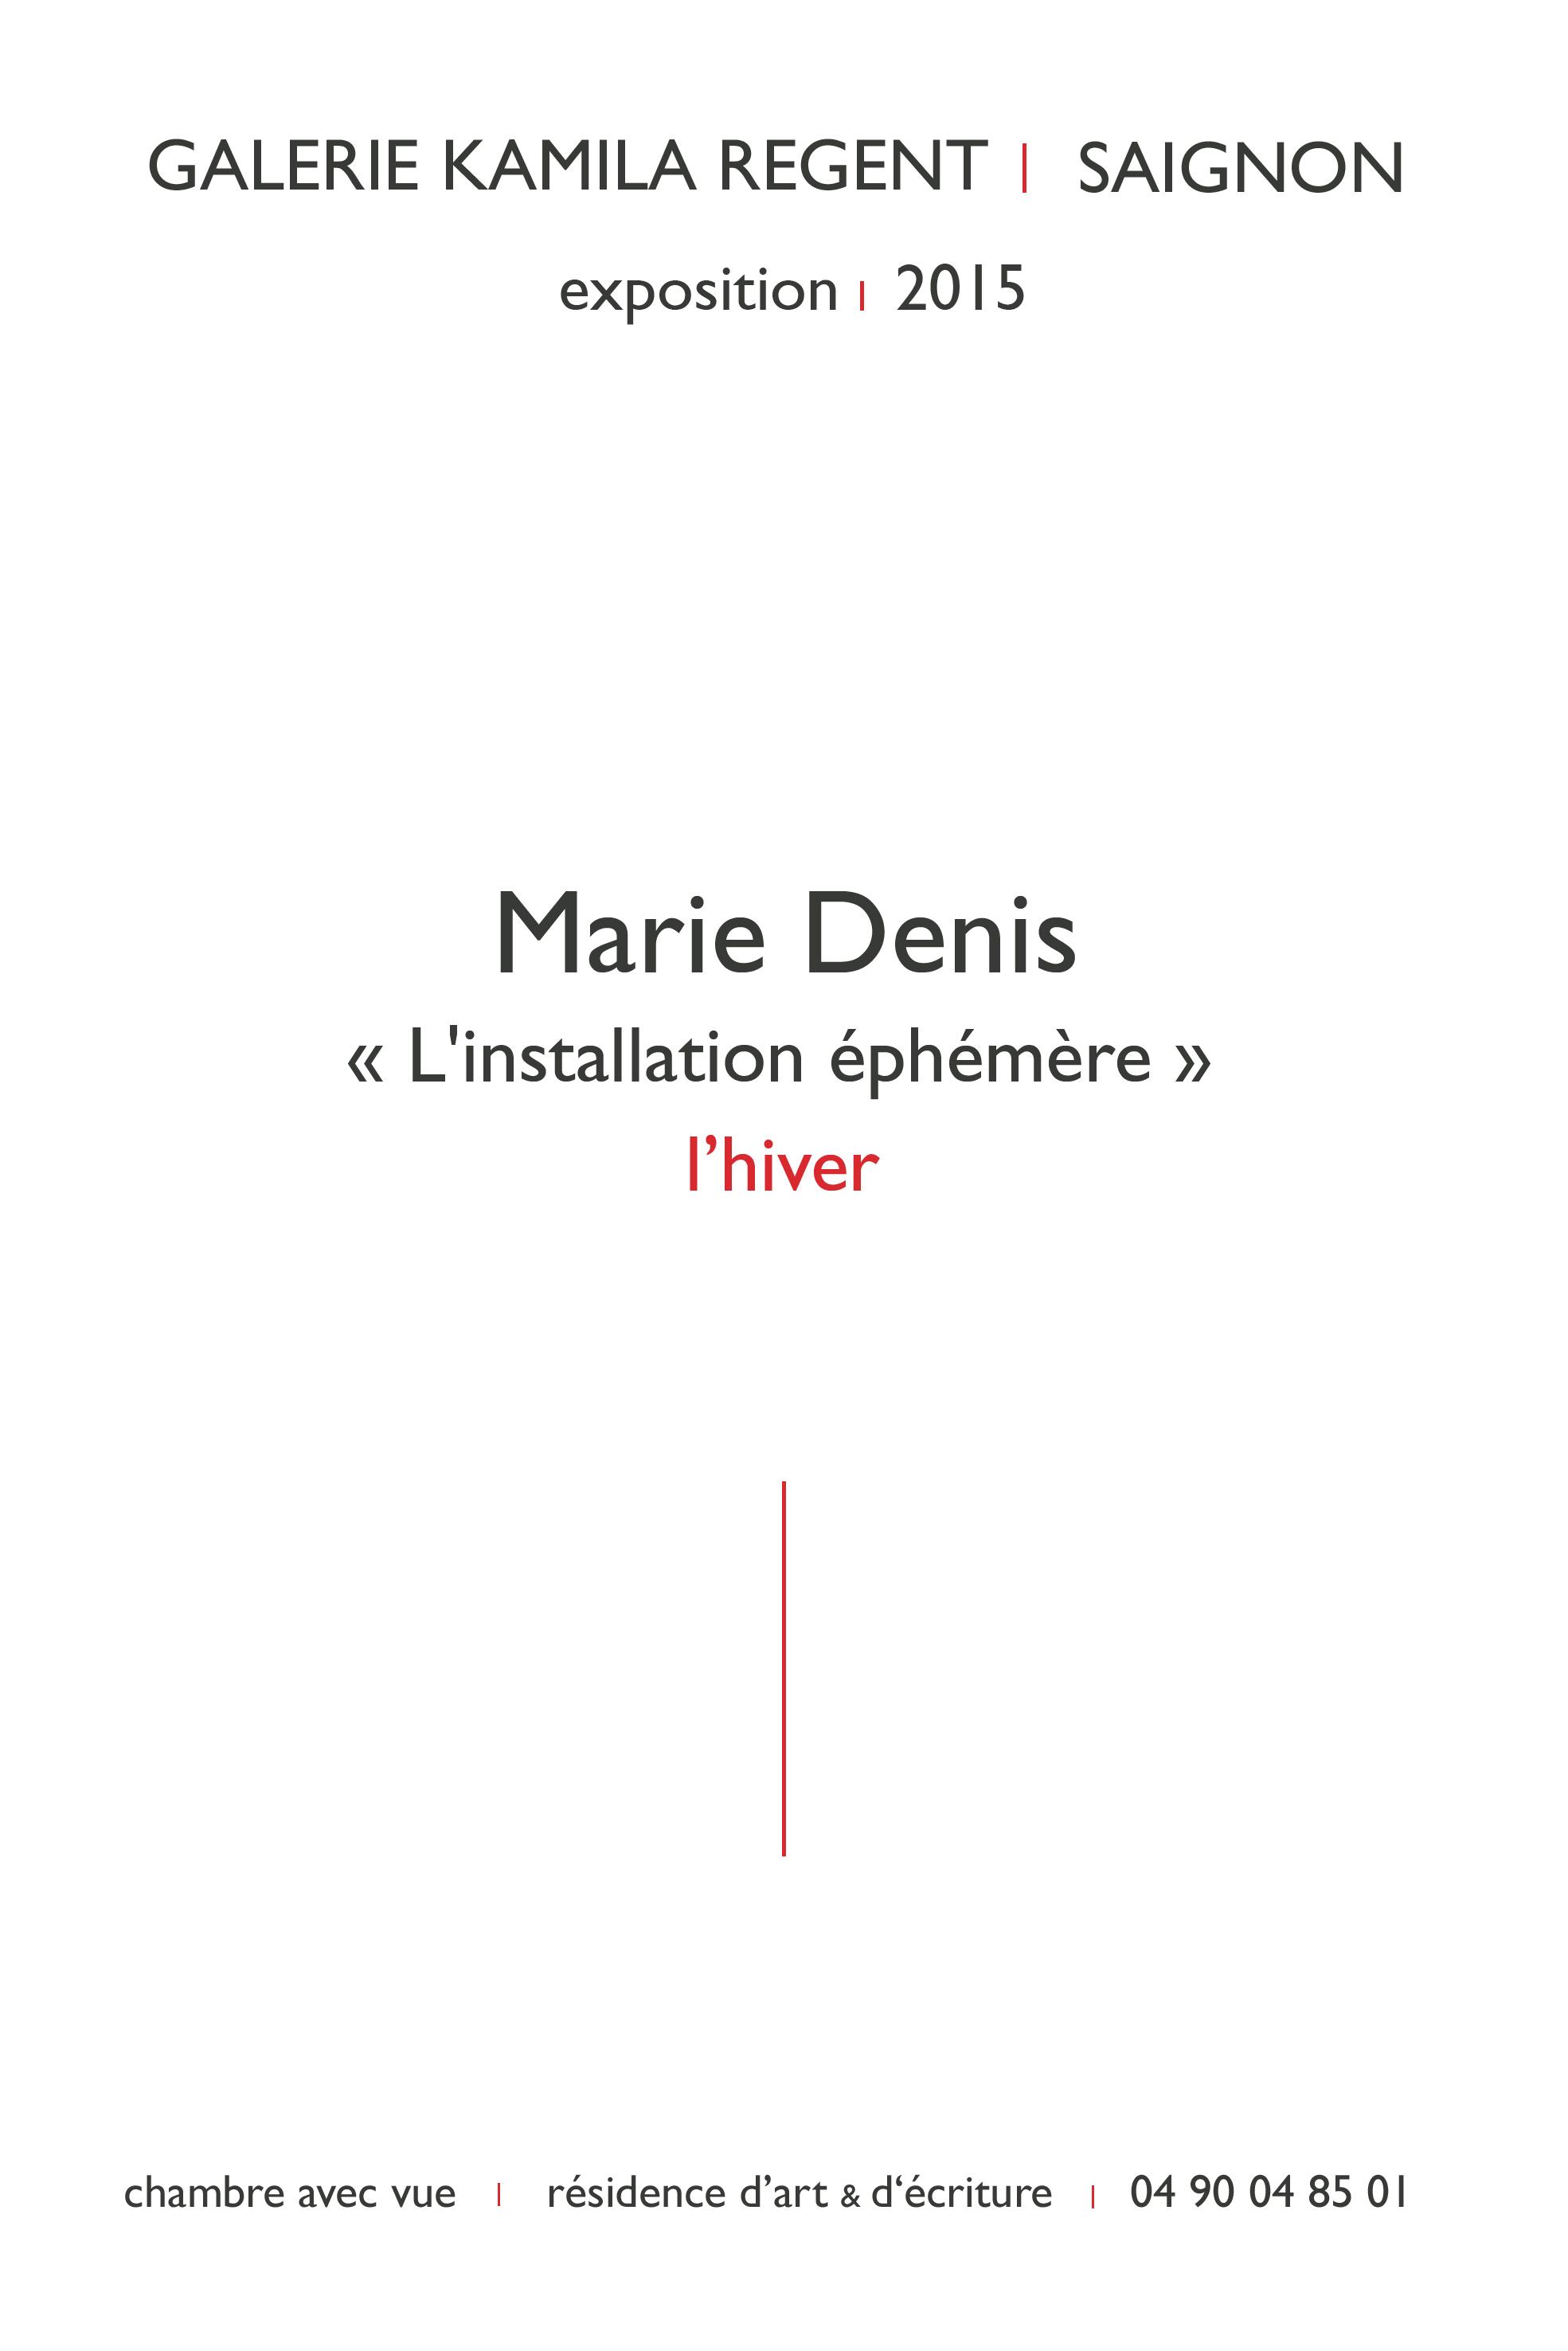 Marie Denis | Galerie Kamila Regent